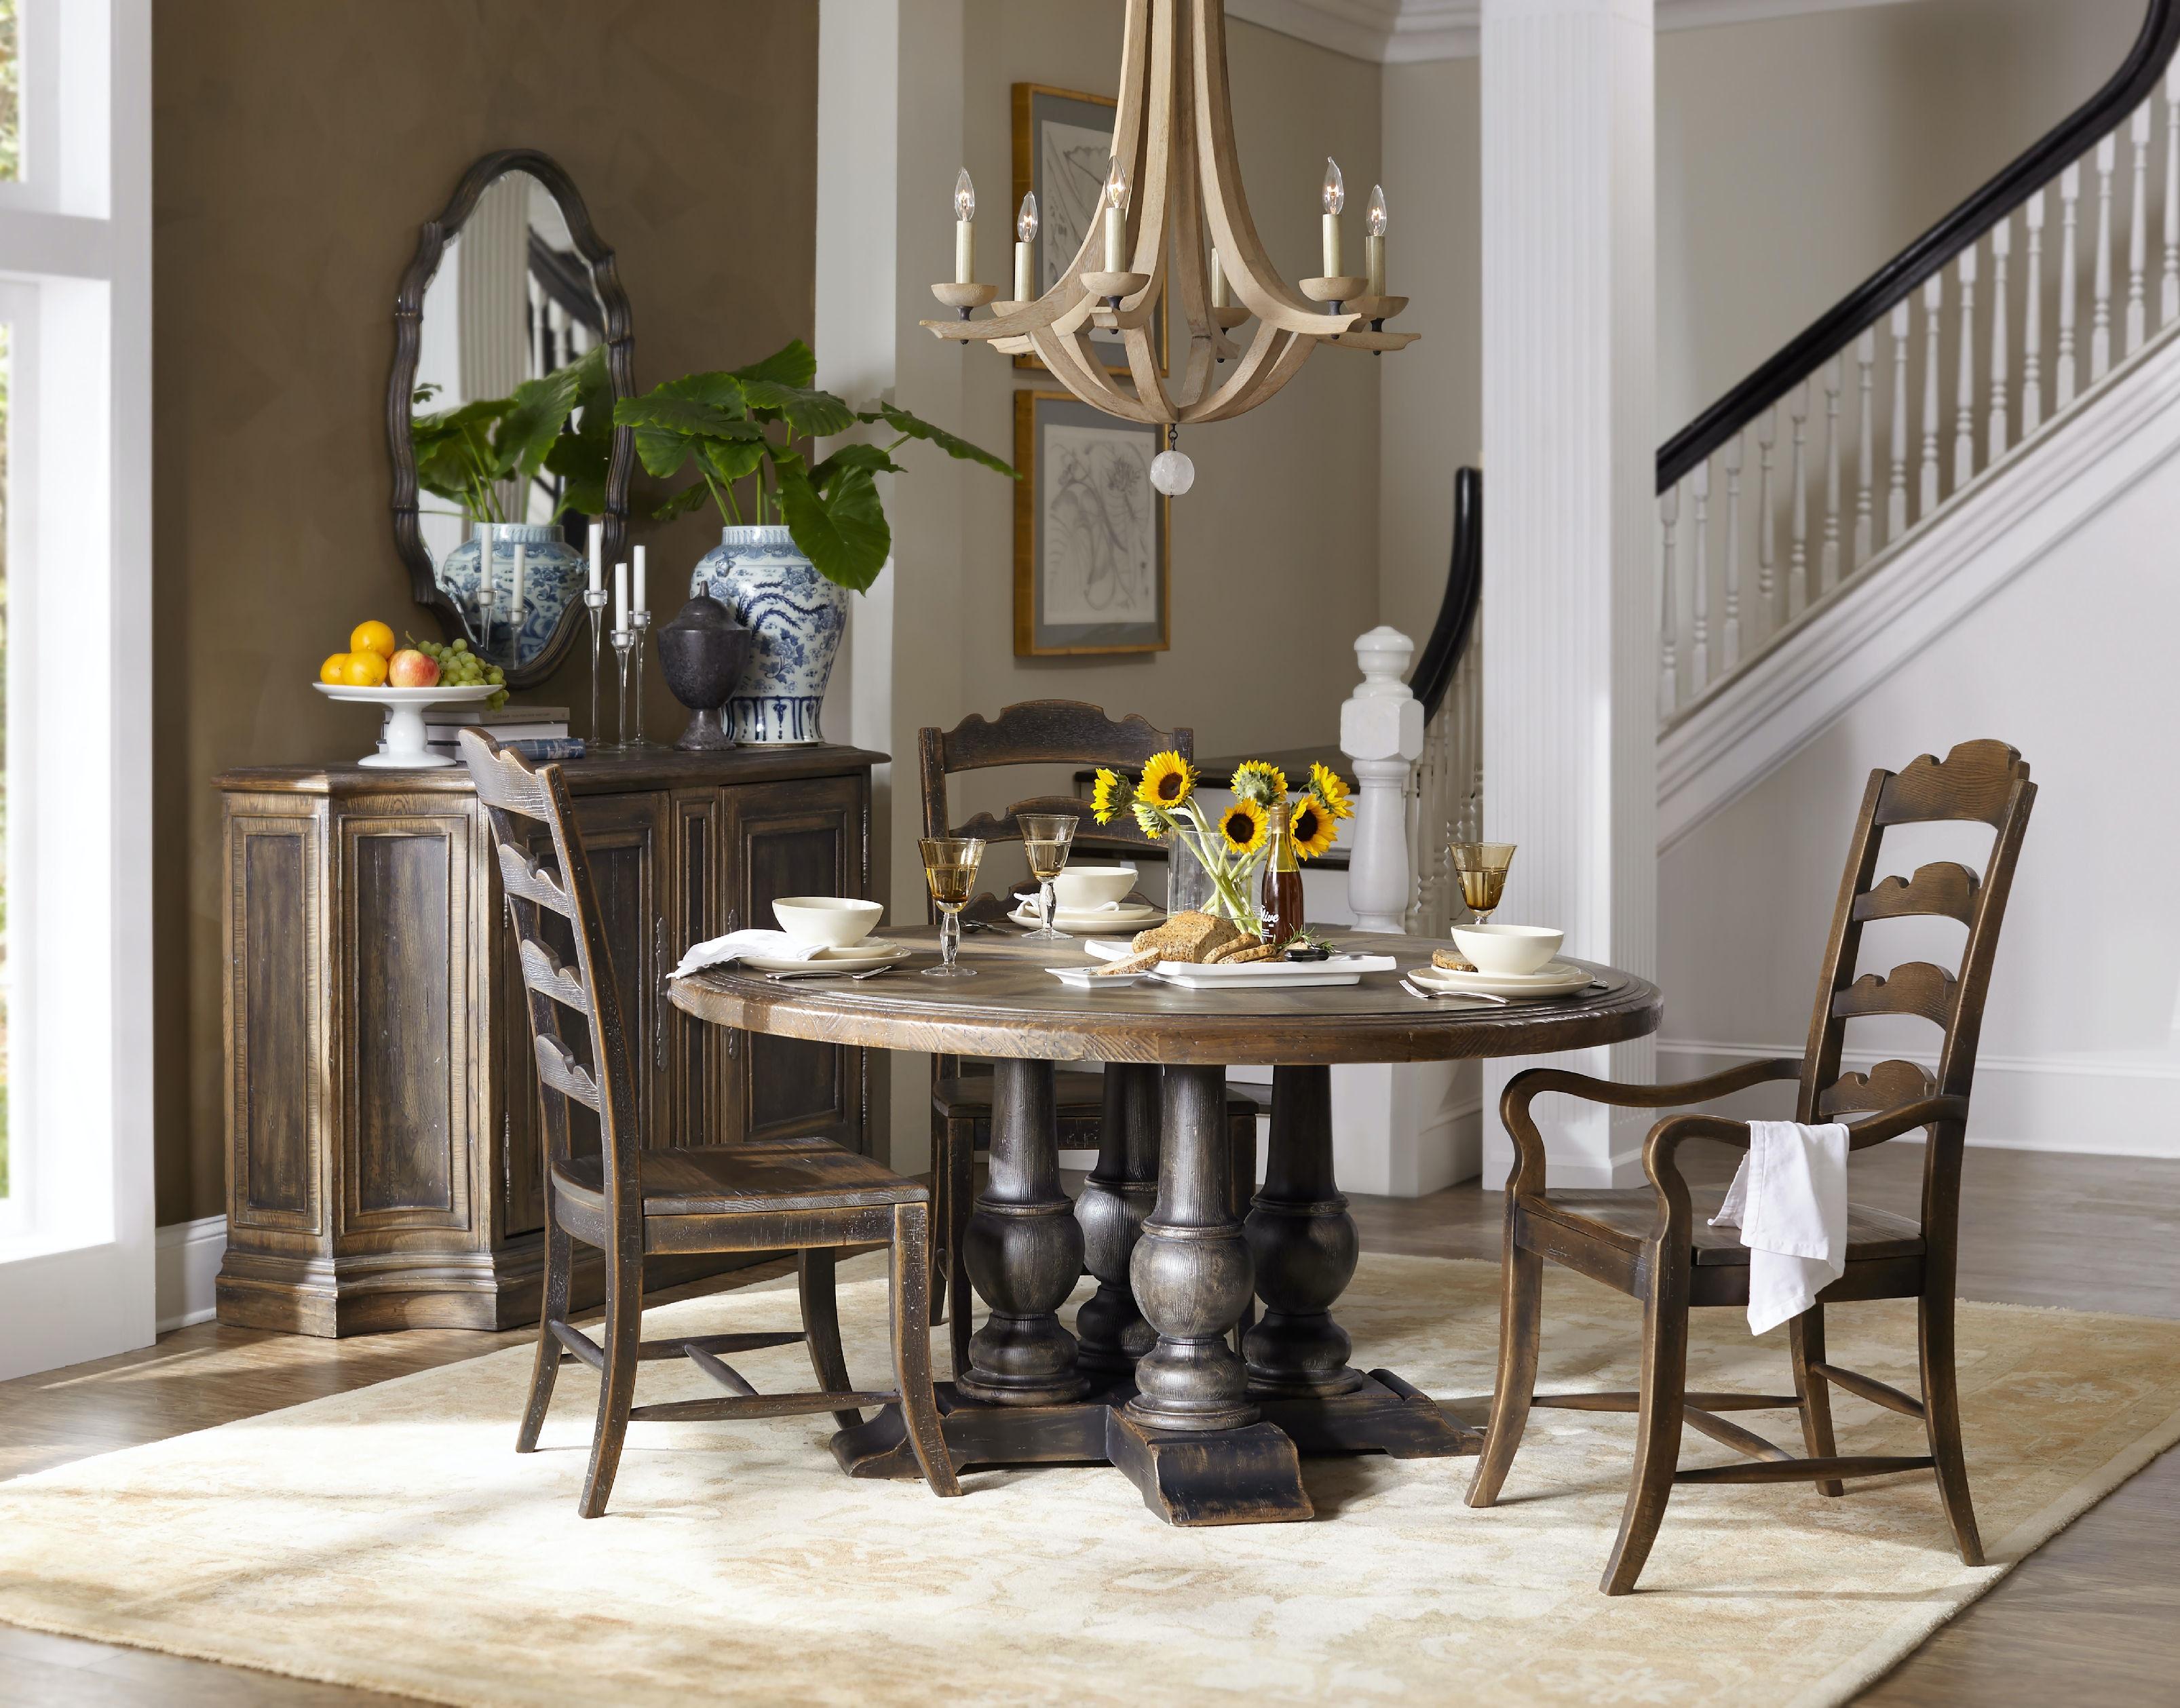 hooker furniture dining room applewhite 60in round dining table 5960 75203 brn. Black Bedroom Furniture Sets. Home Design Ideas